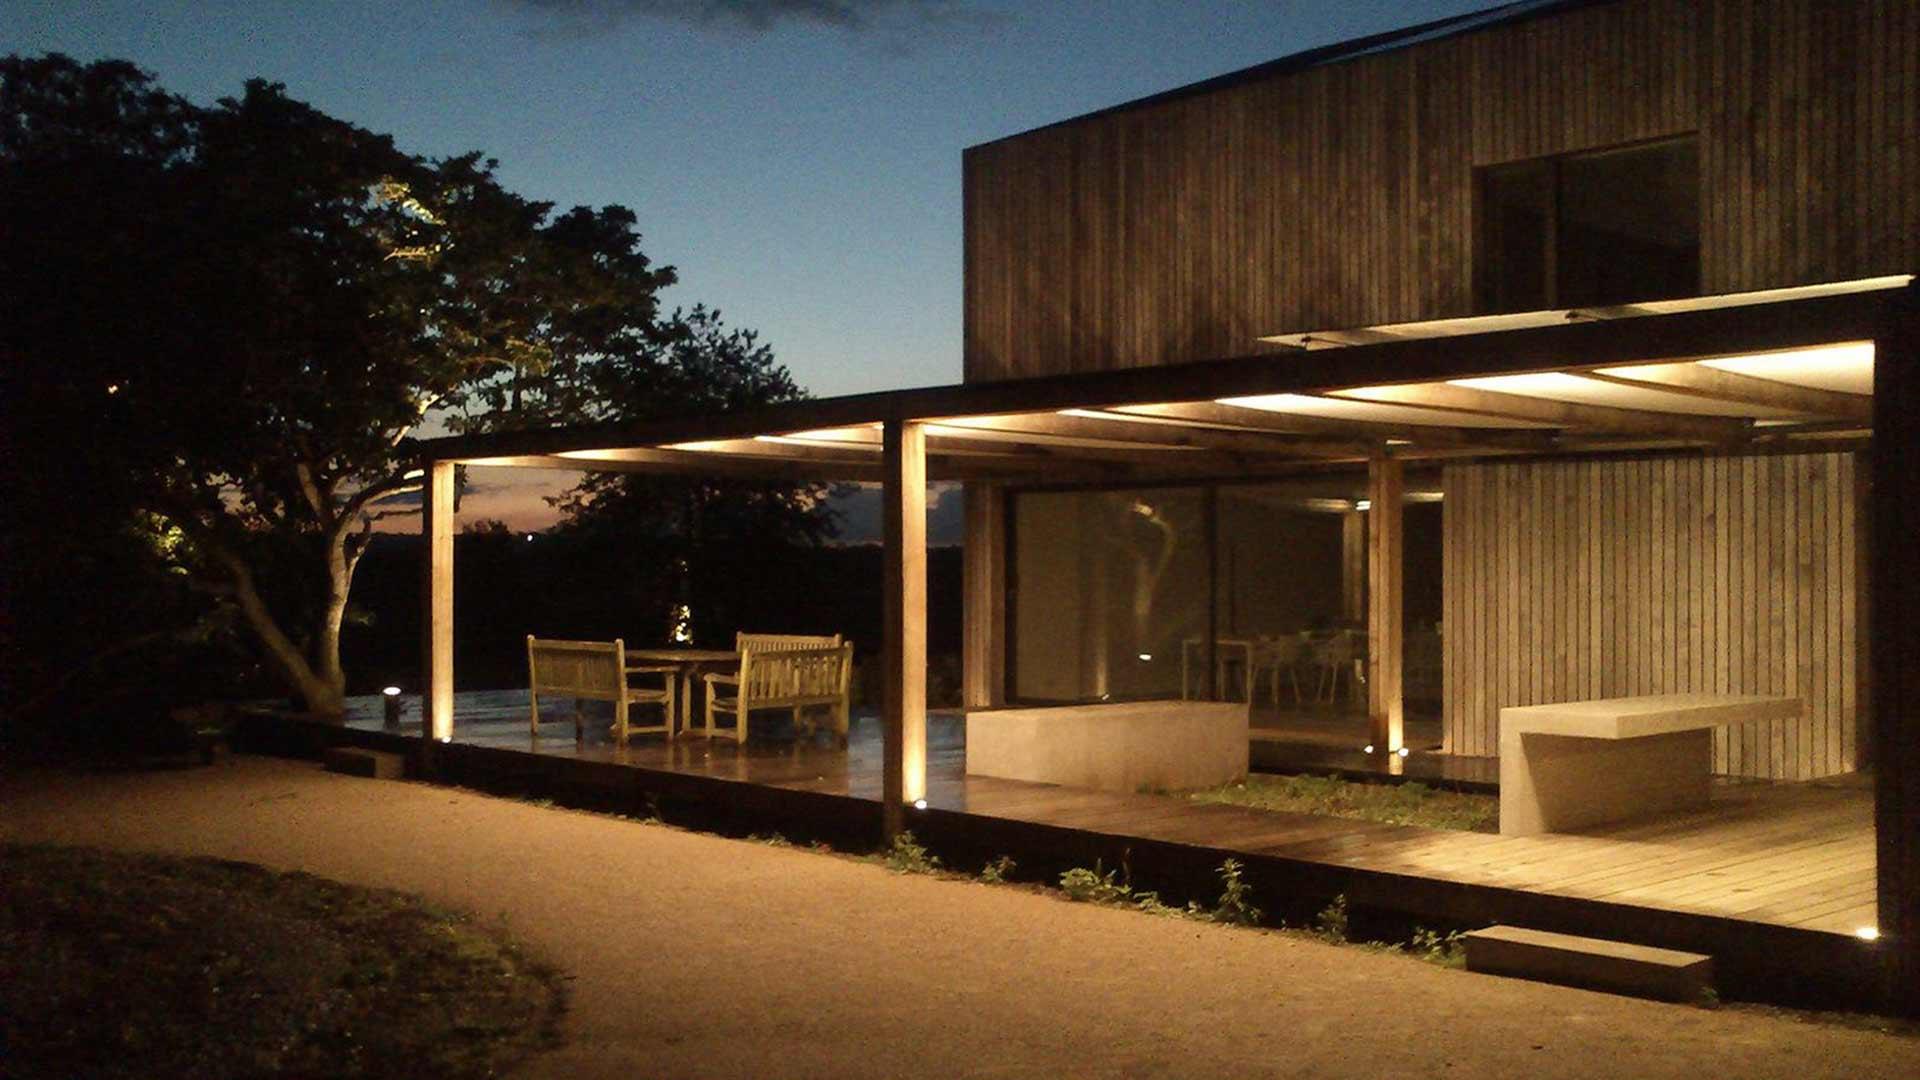 Illuminated Pergola Night Seating House Exterior Light Nulty